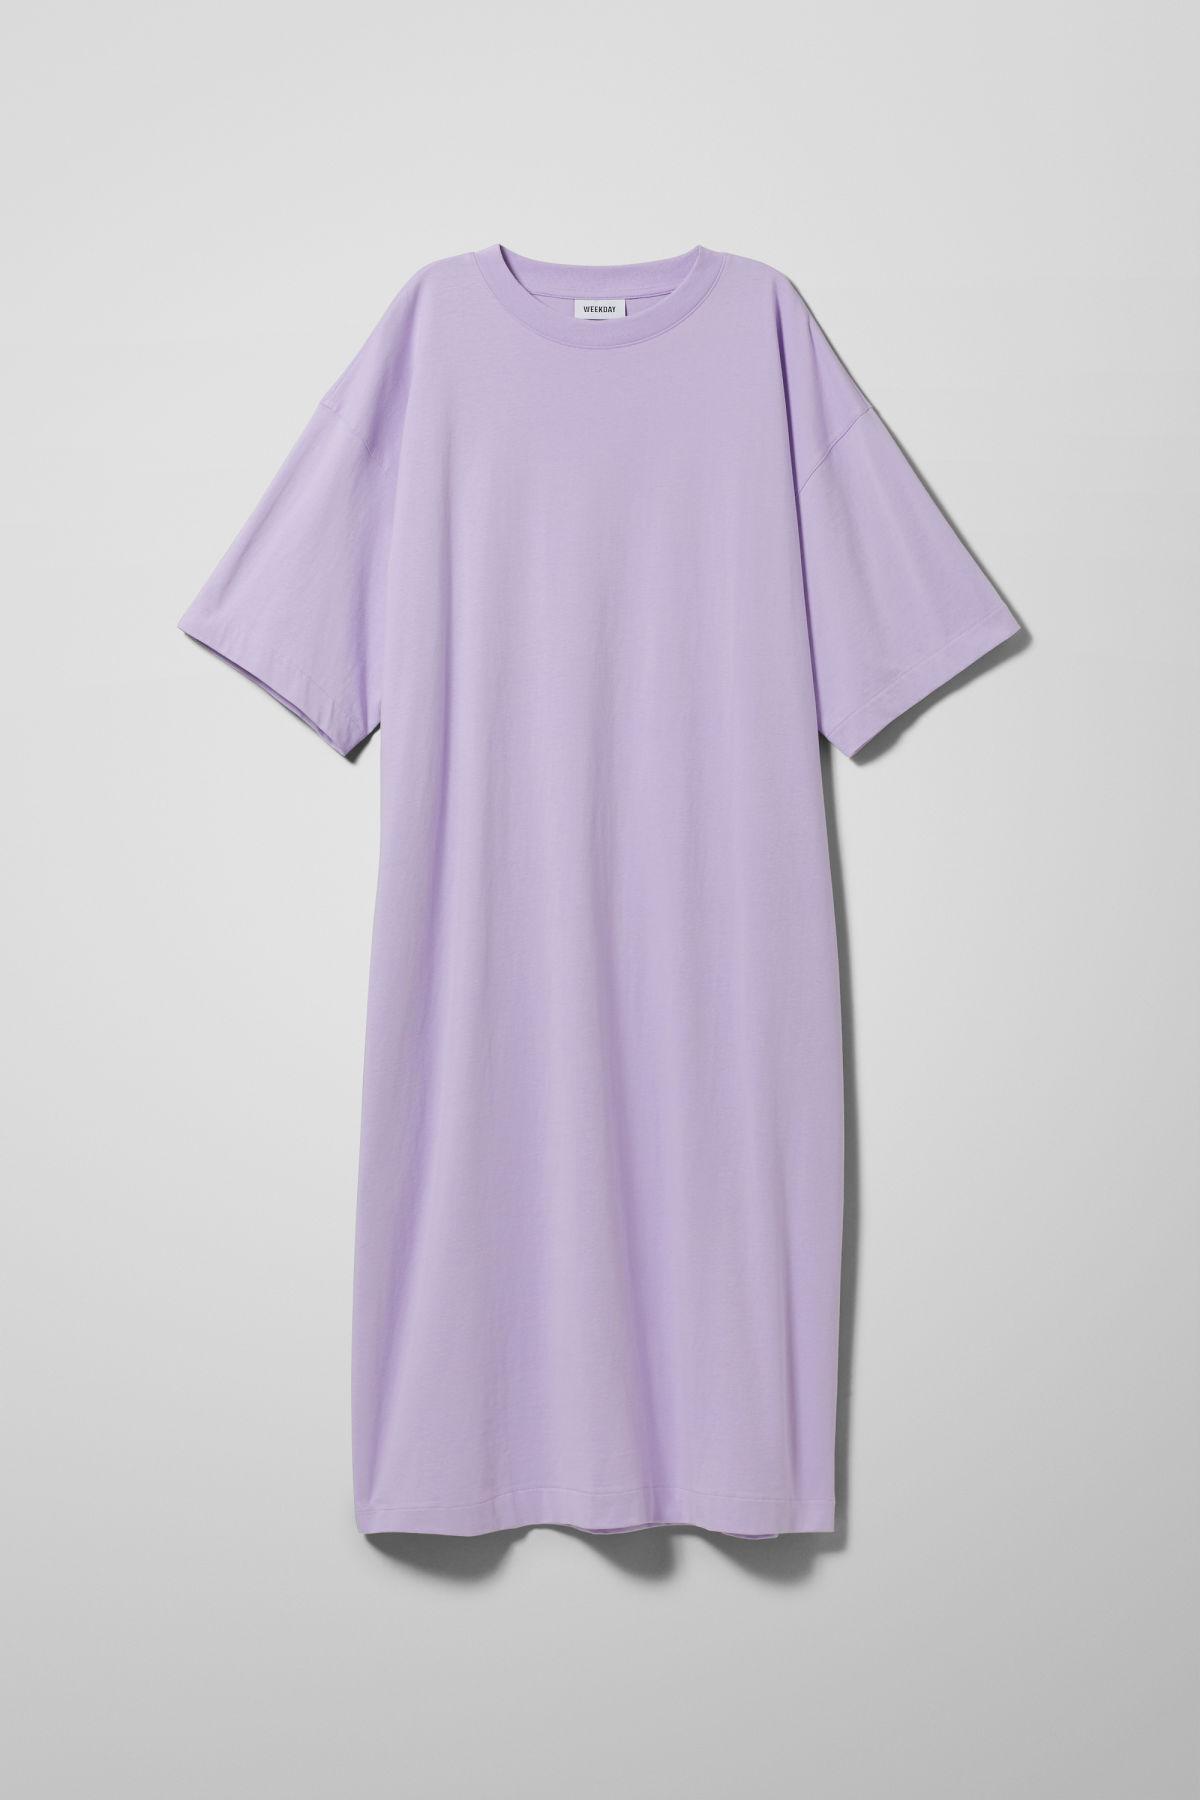 Image of Ines T-Shirt Dress - Purple-M